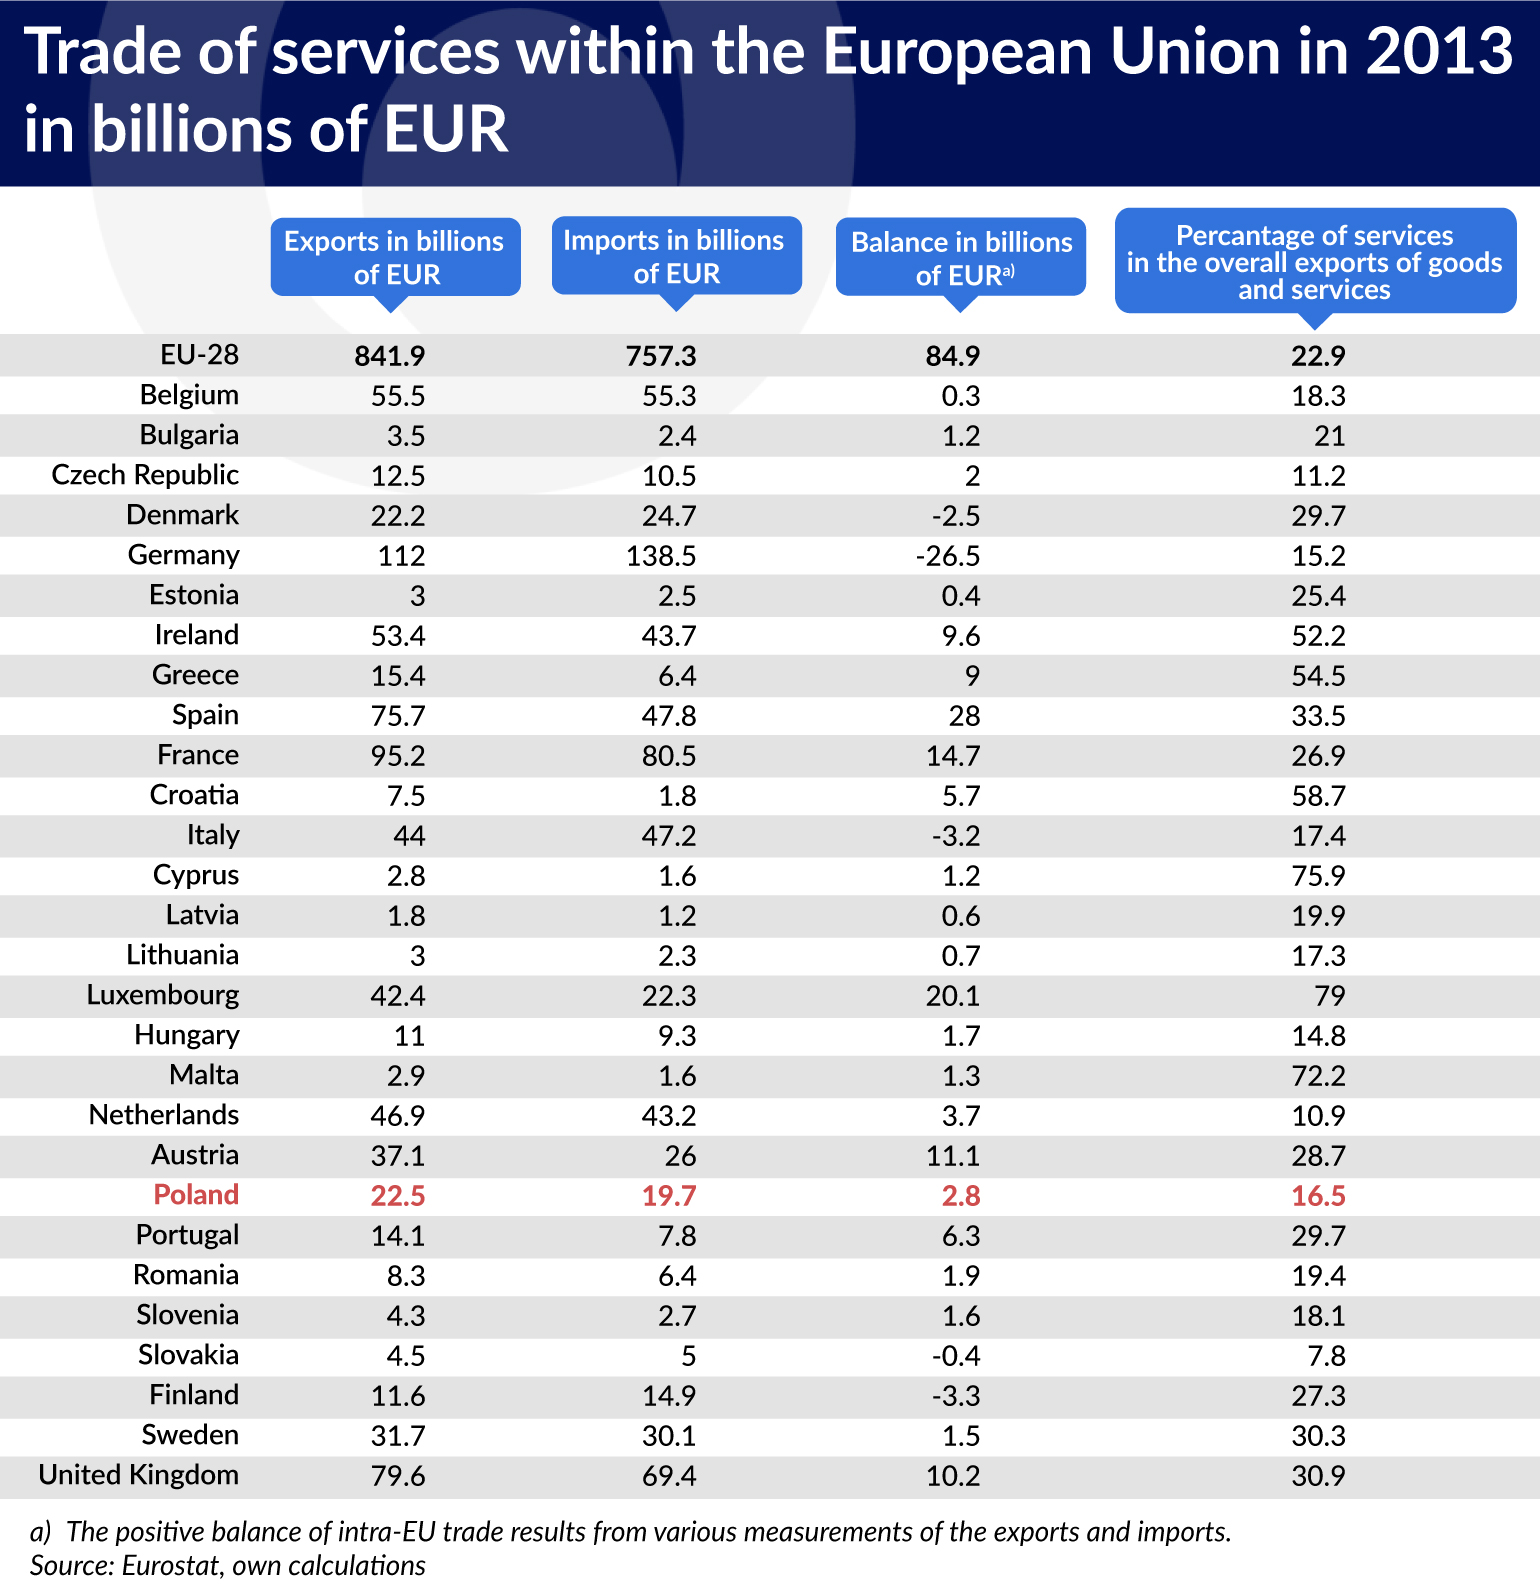 wspolny-rynek-trudny-dla-uslug-trade-of-services-eu